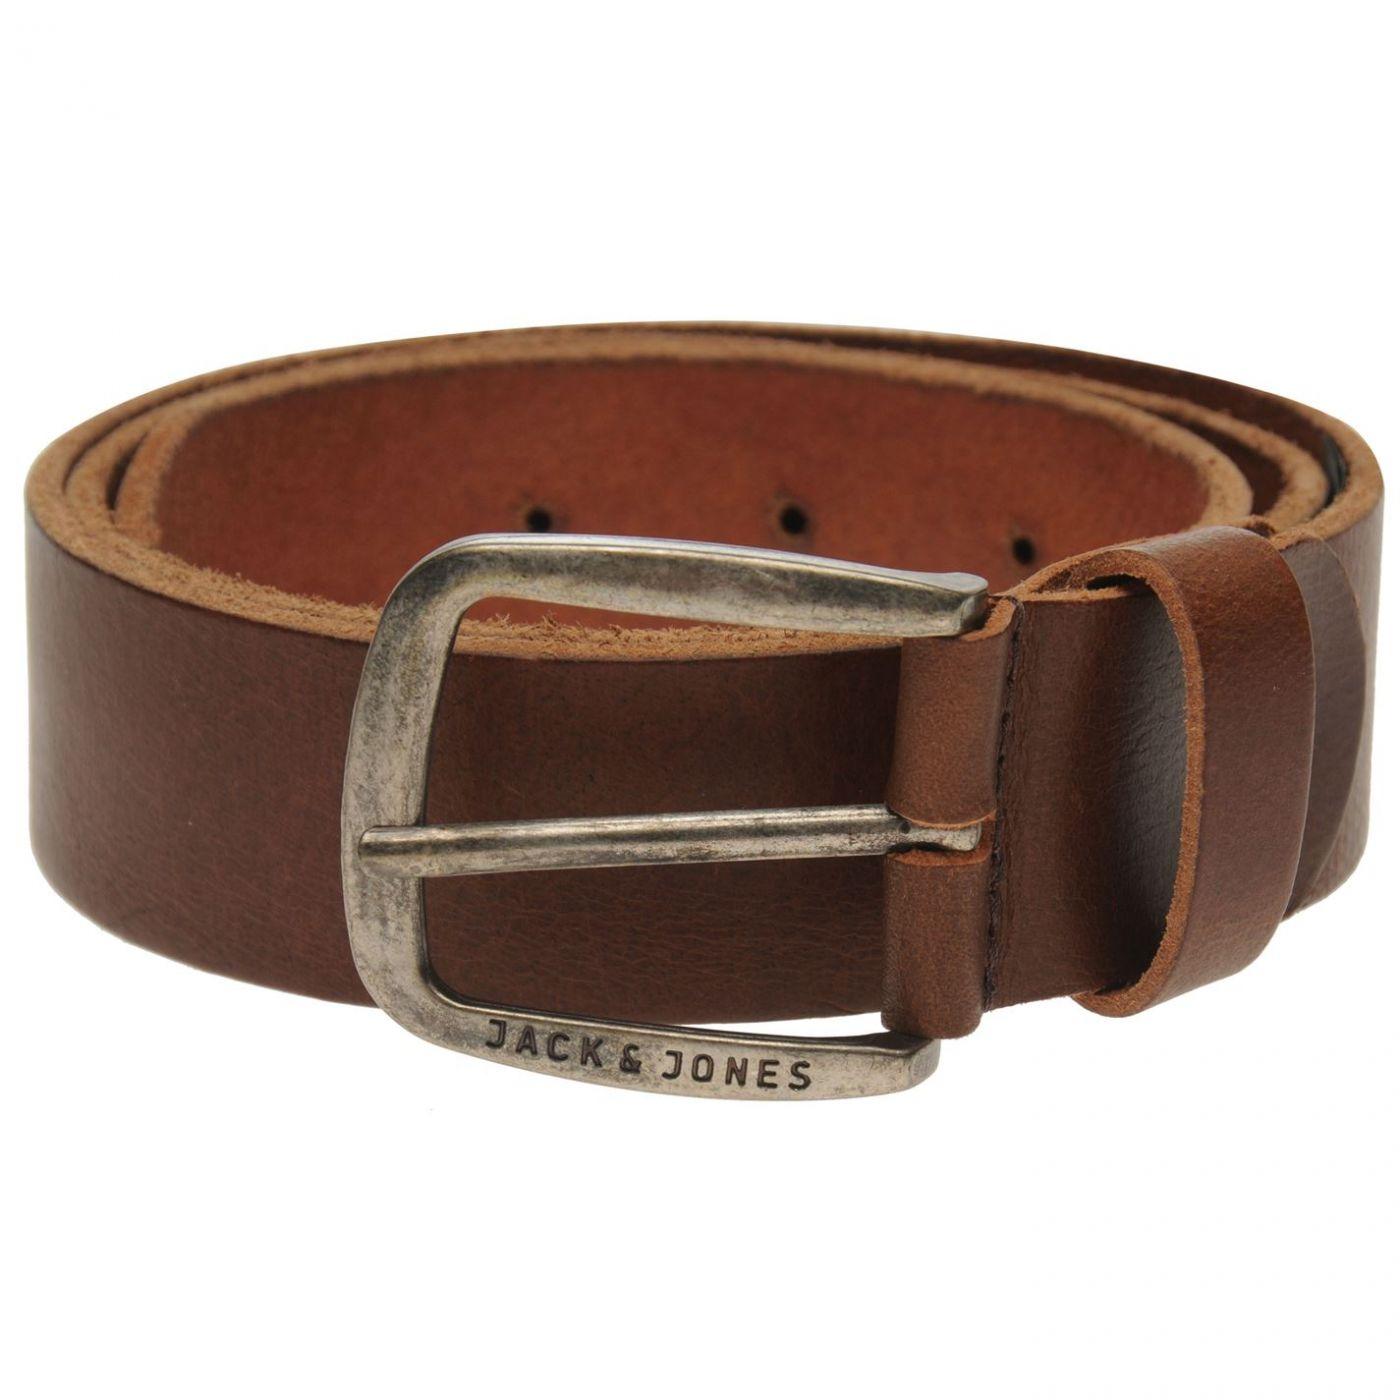 Jack and Jones Paul Leather Belt